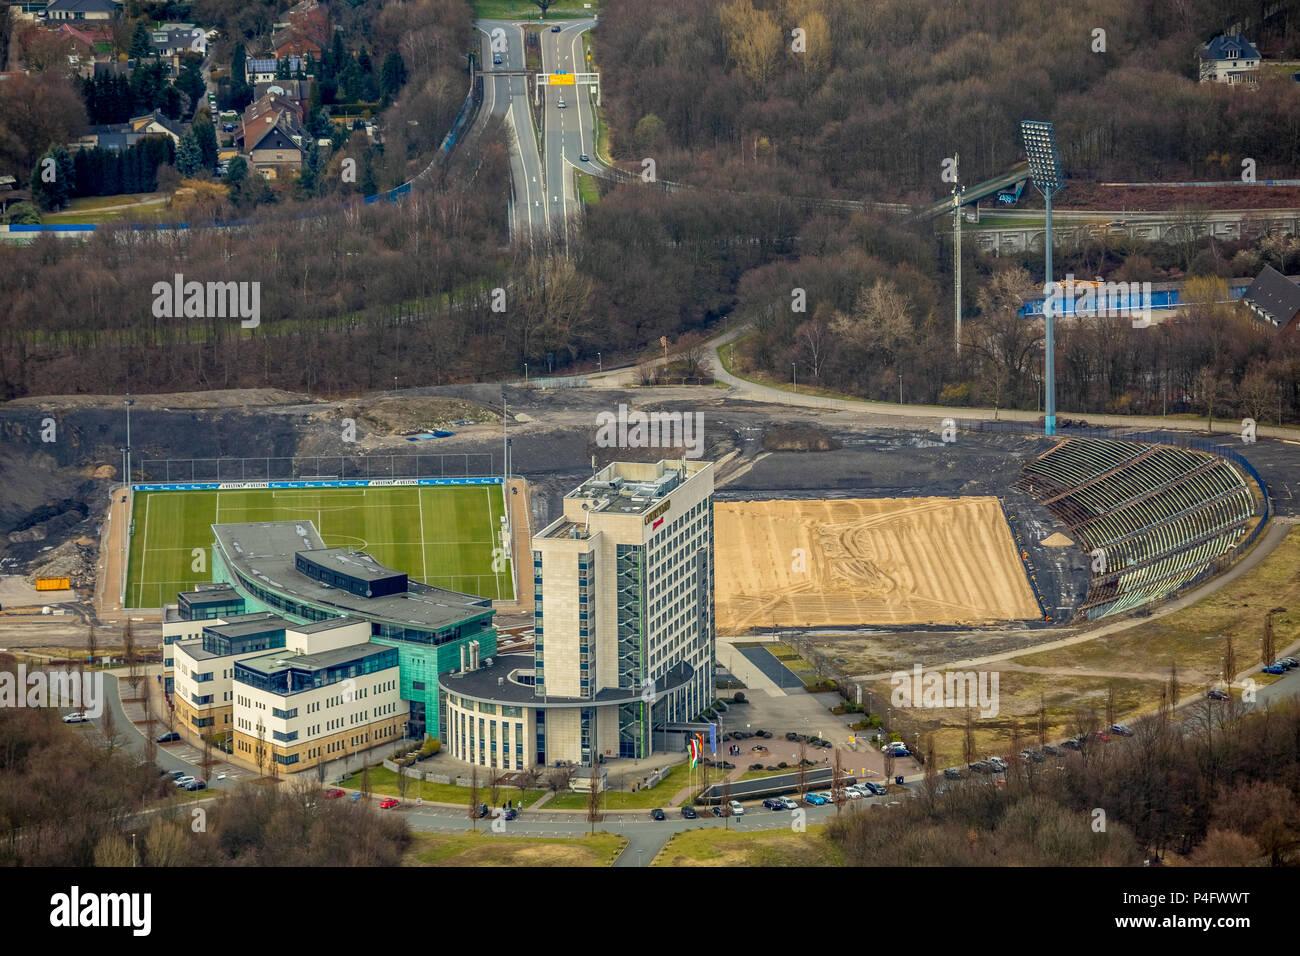 Arena on Schalke, Veltins Arena, medicos.AufSchalke Reha GmbH & Co. KG, grounds of the S04 Schalke Association with reconstruction of the Park Stadium - Stock Image